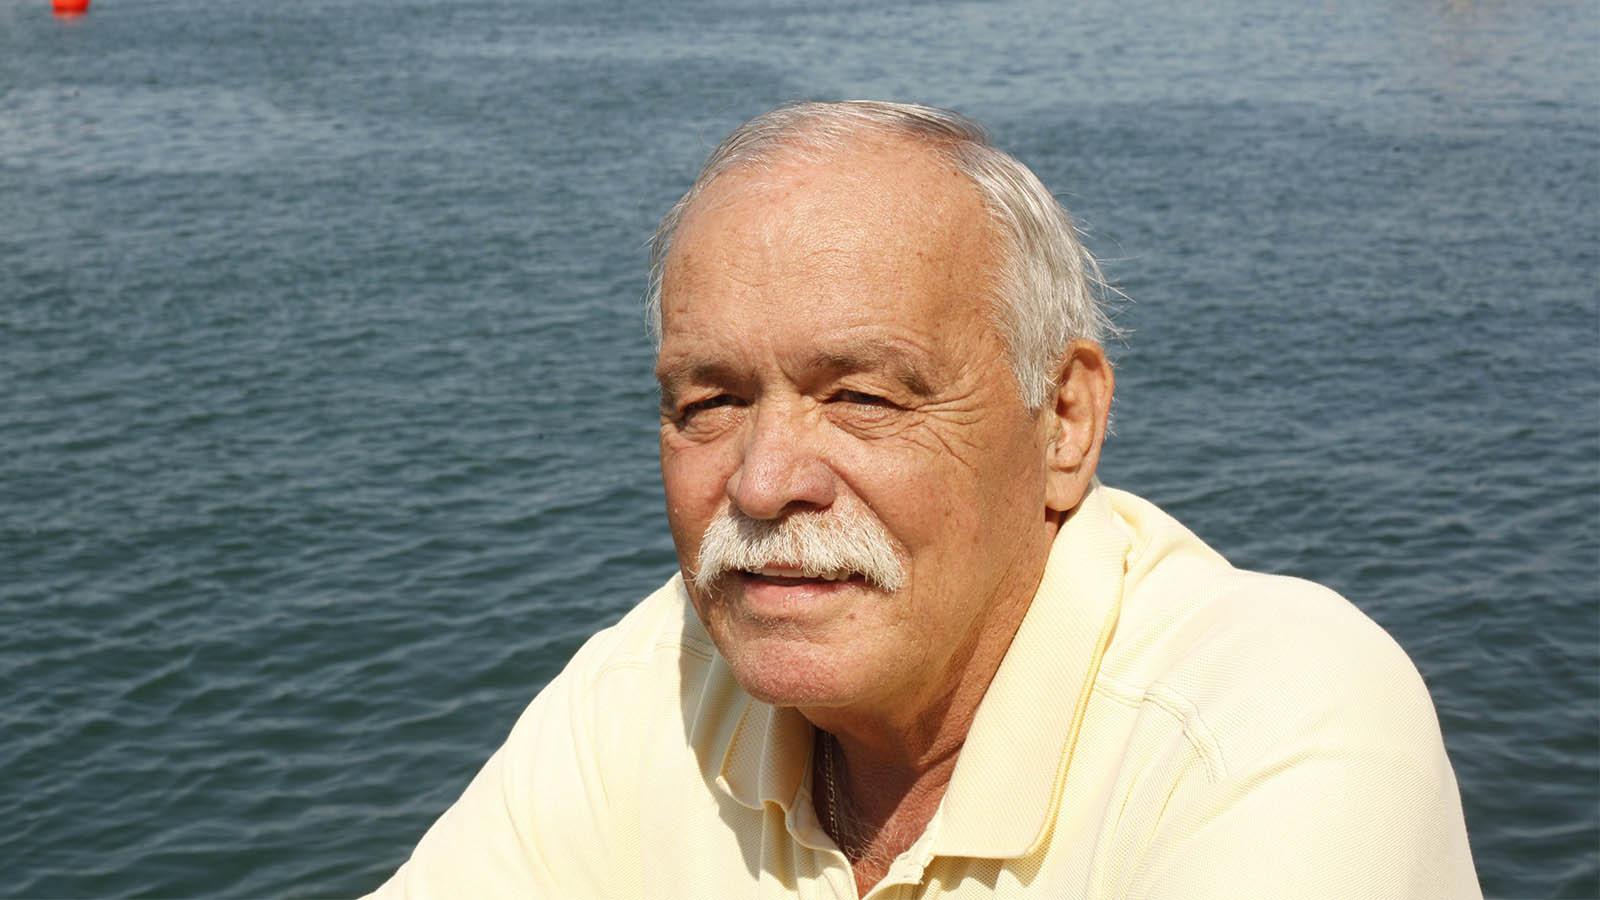 Niagara County park to be renamed for deceased legislator Burmaster